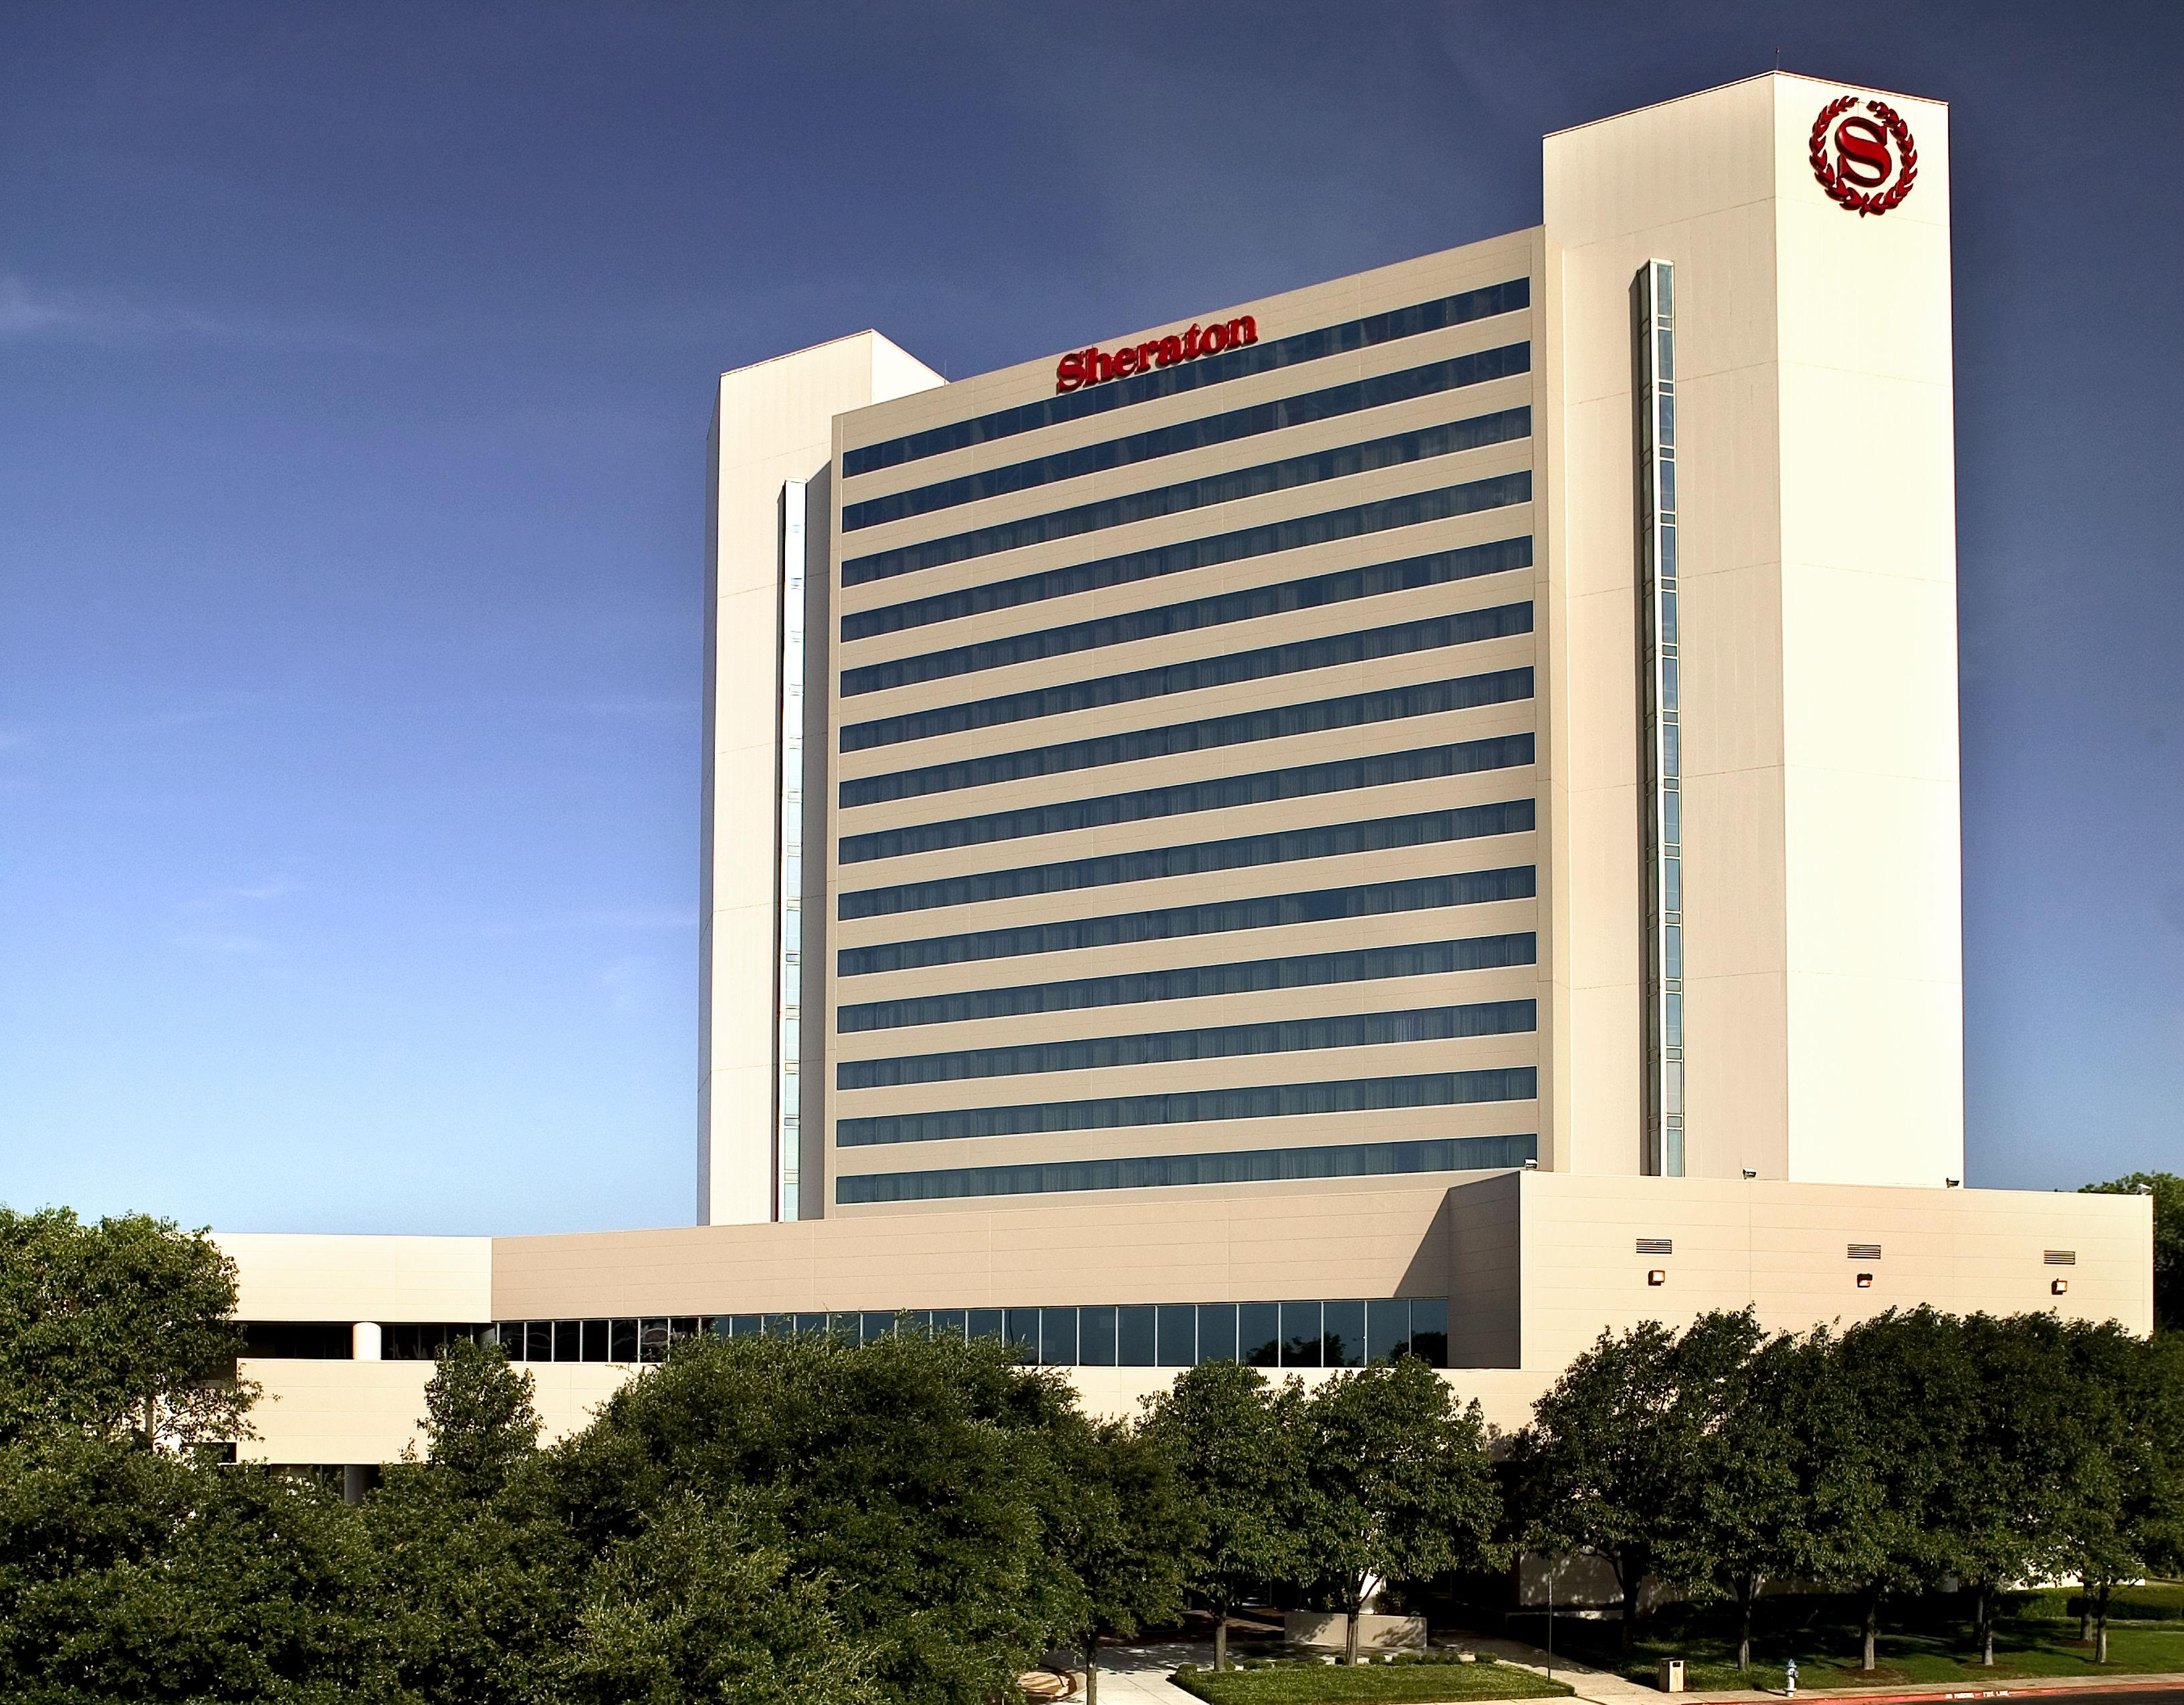 Arlington Tx Hotels Near Convention Center